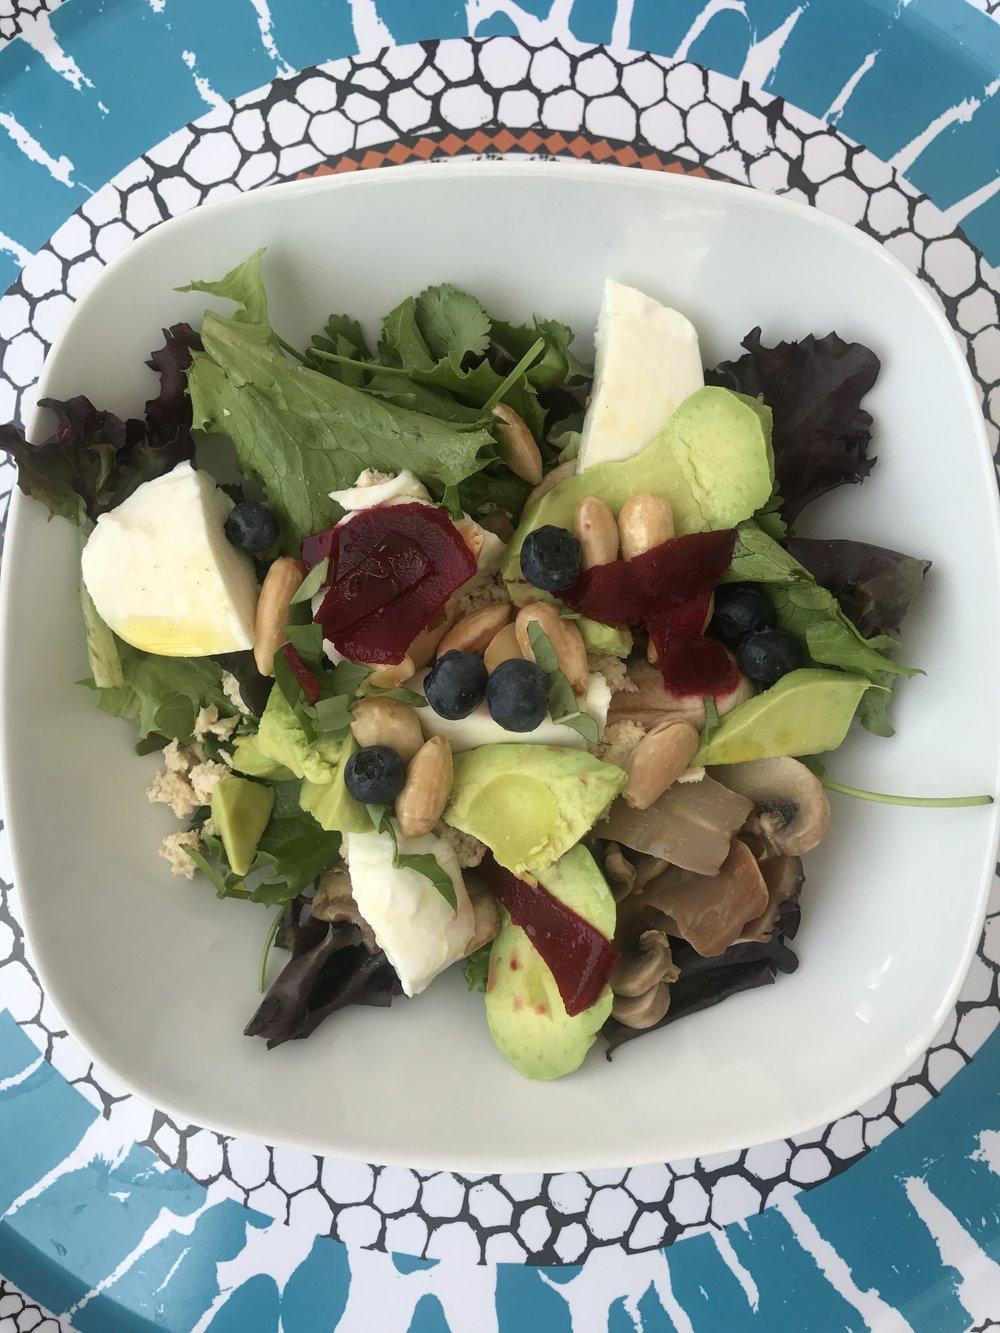 Salada - Mix de folhas. Queijo Mozzarella. Abacate. Beterraba. Cogumelos frescos. Amendoim. Mirtilos.